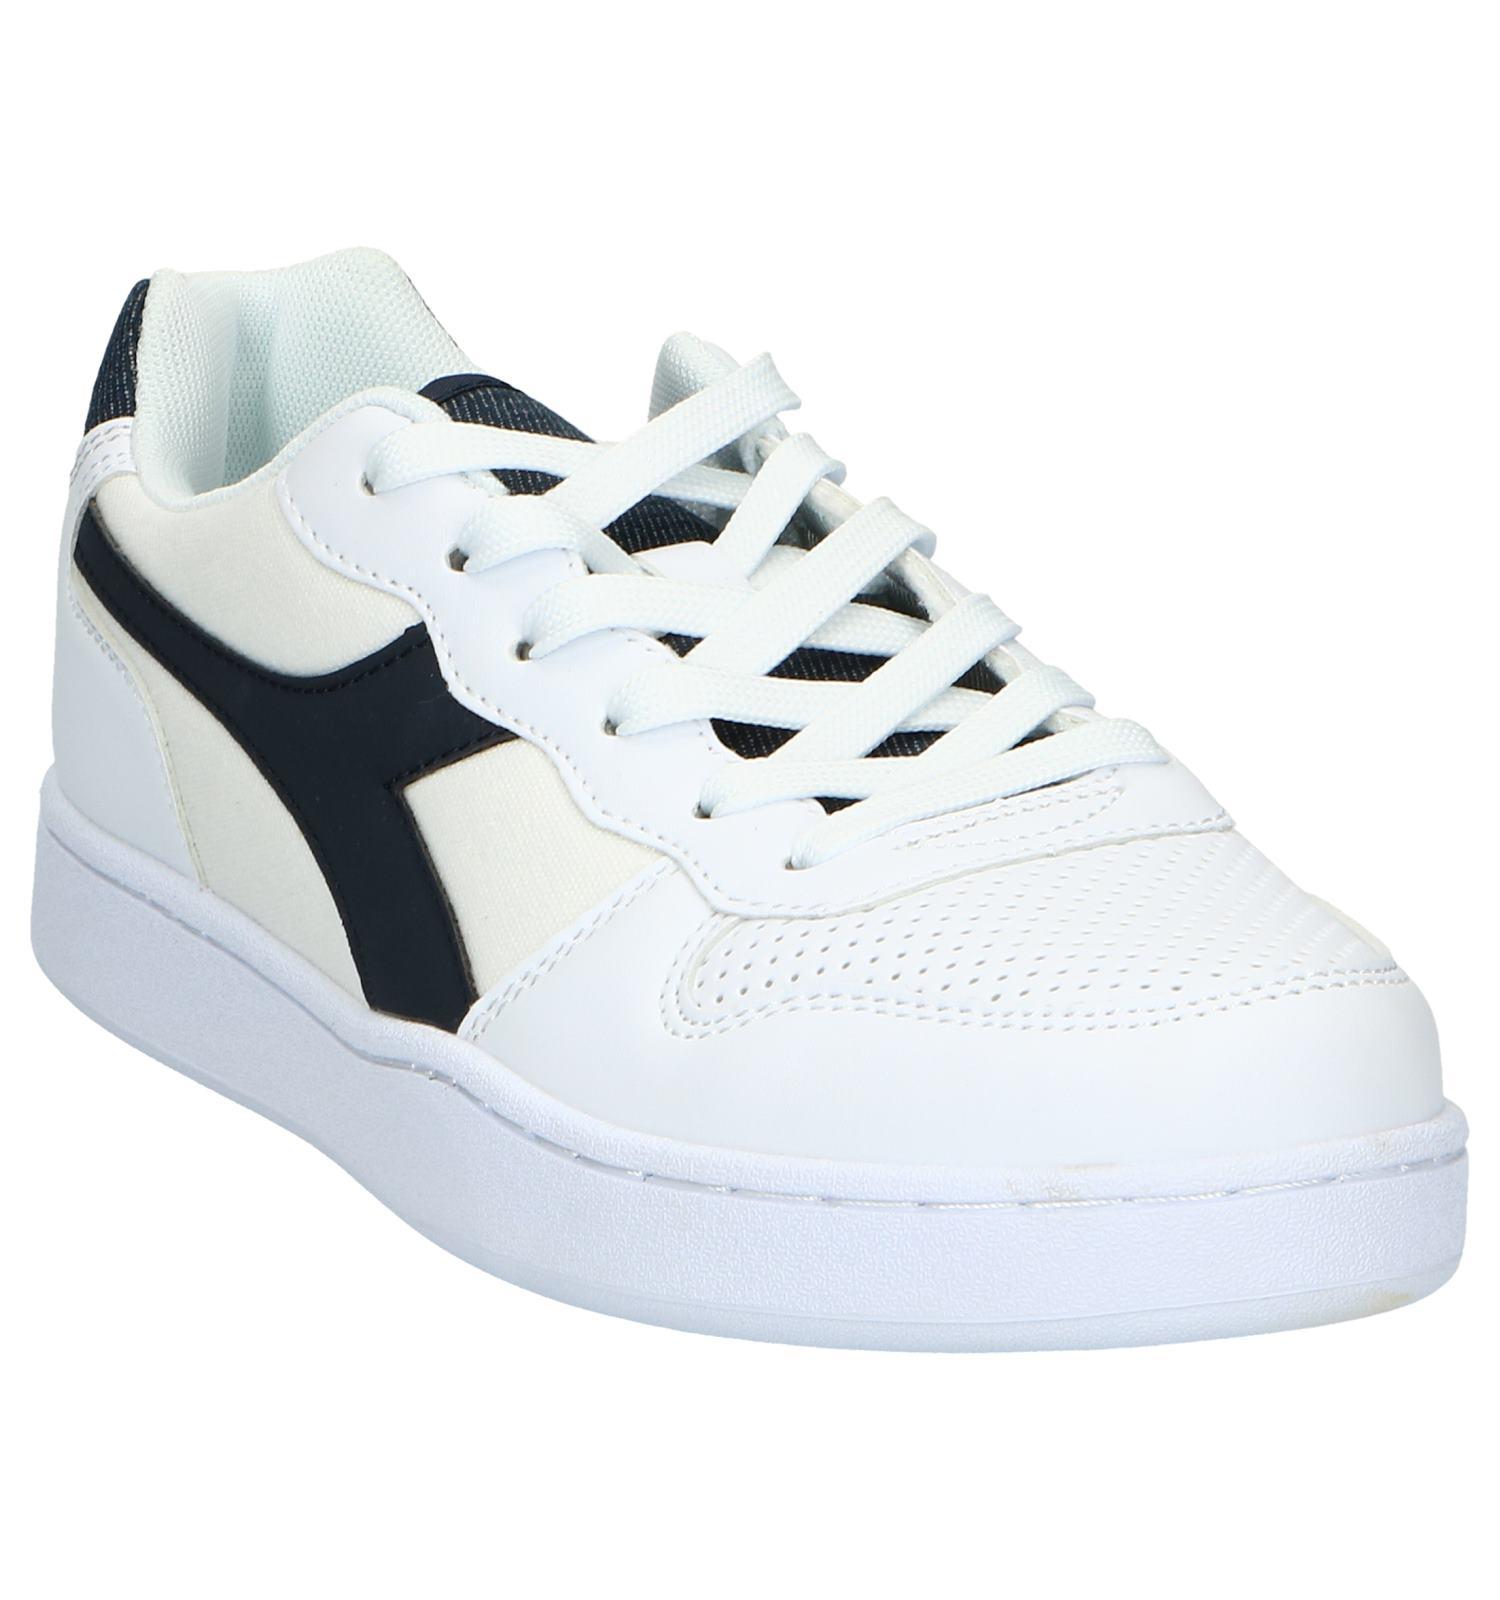 Witte Witte Sneakers Diadora Playground Sneakers Witte Playground Diadora Den Diadora Den Sneakers 53RjALc4q